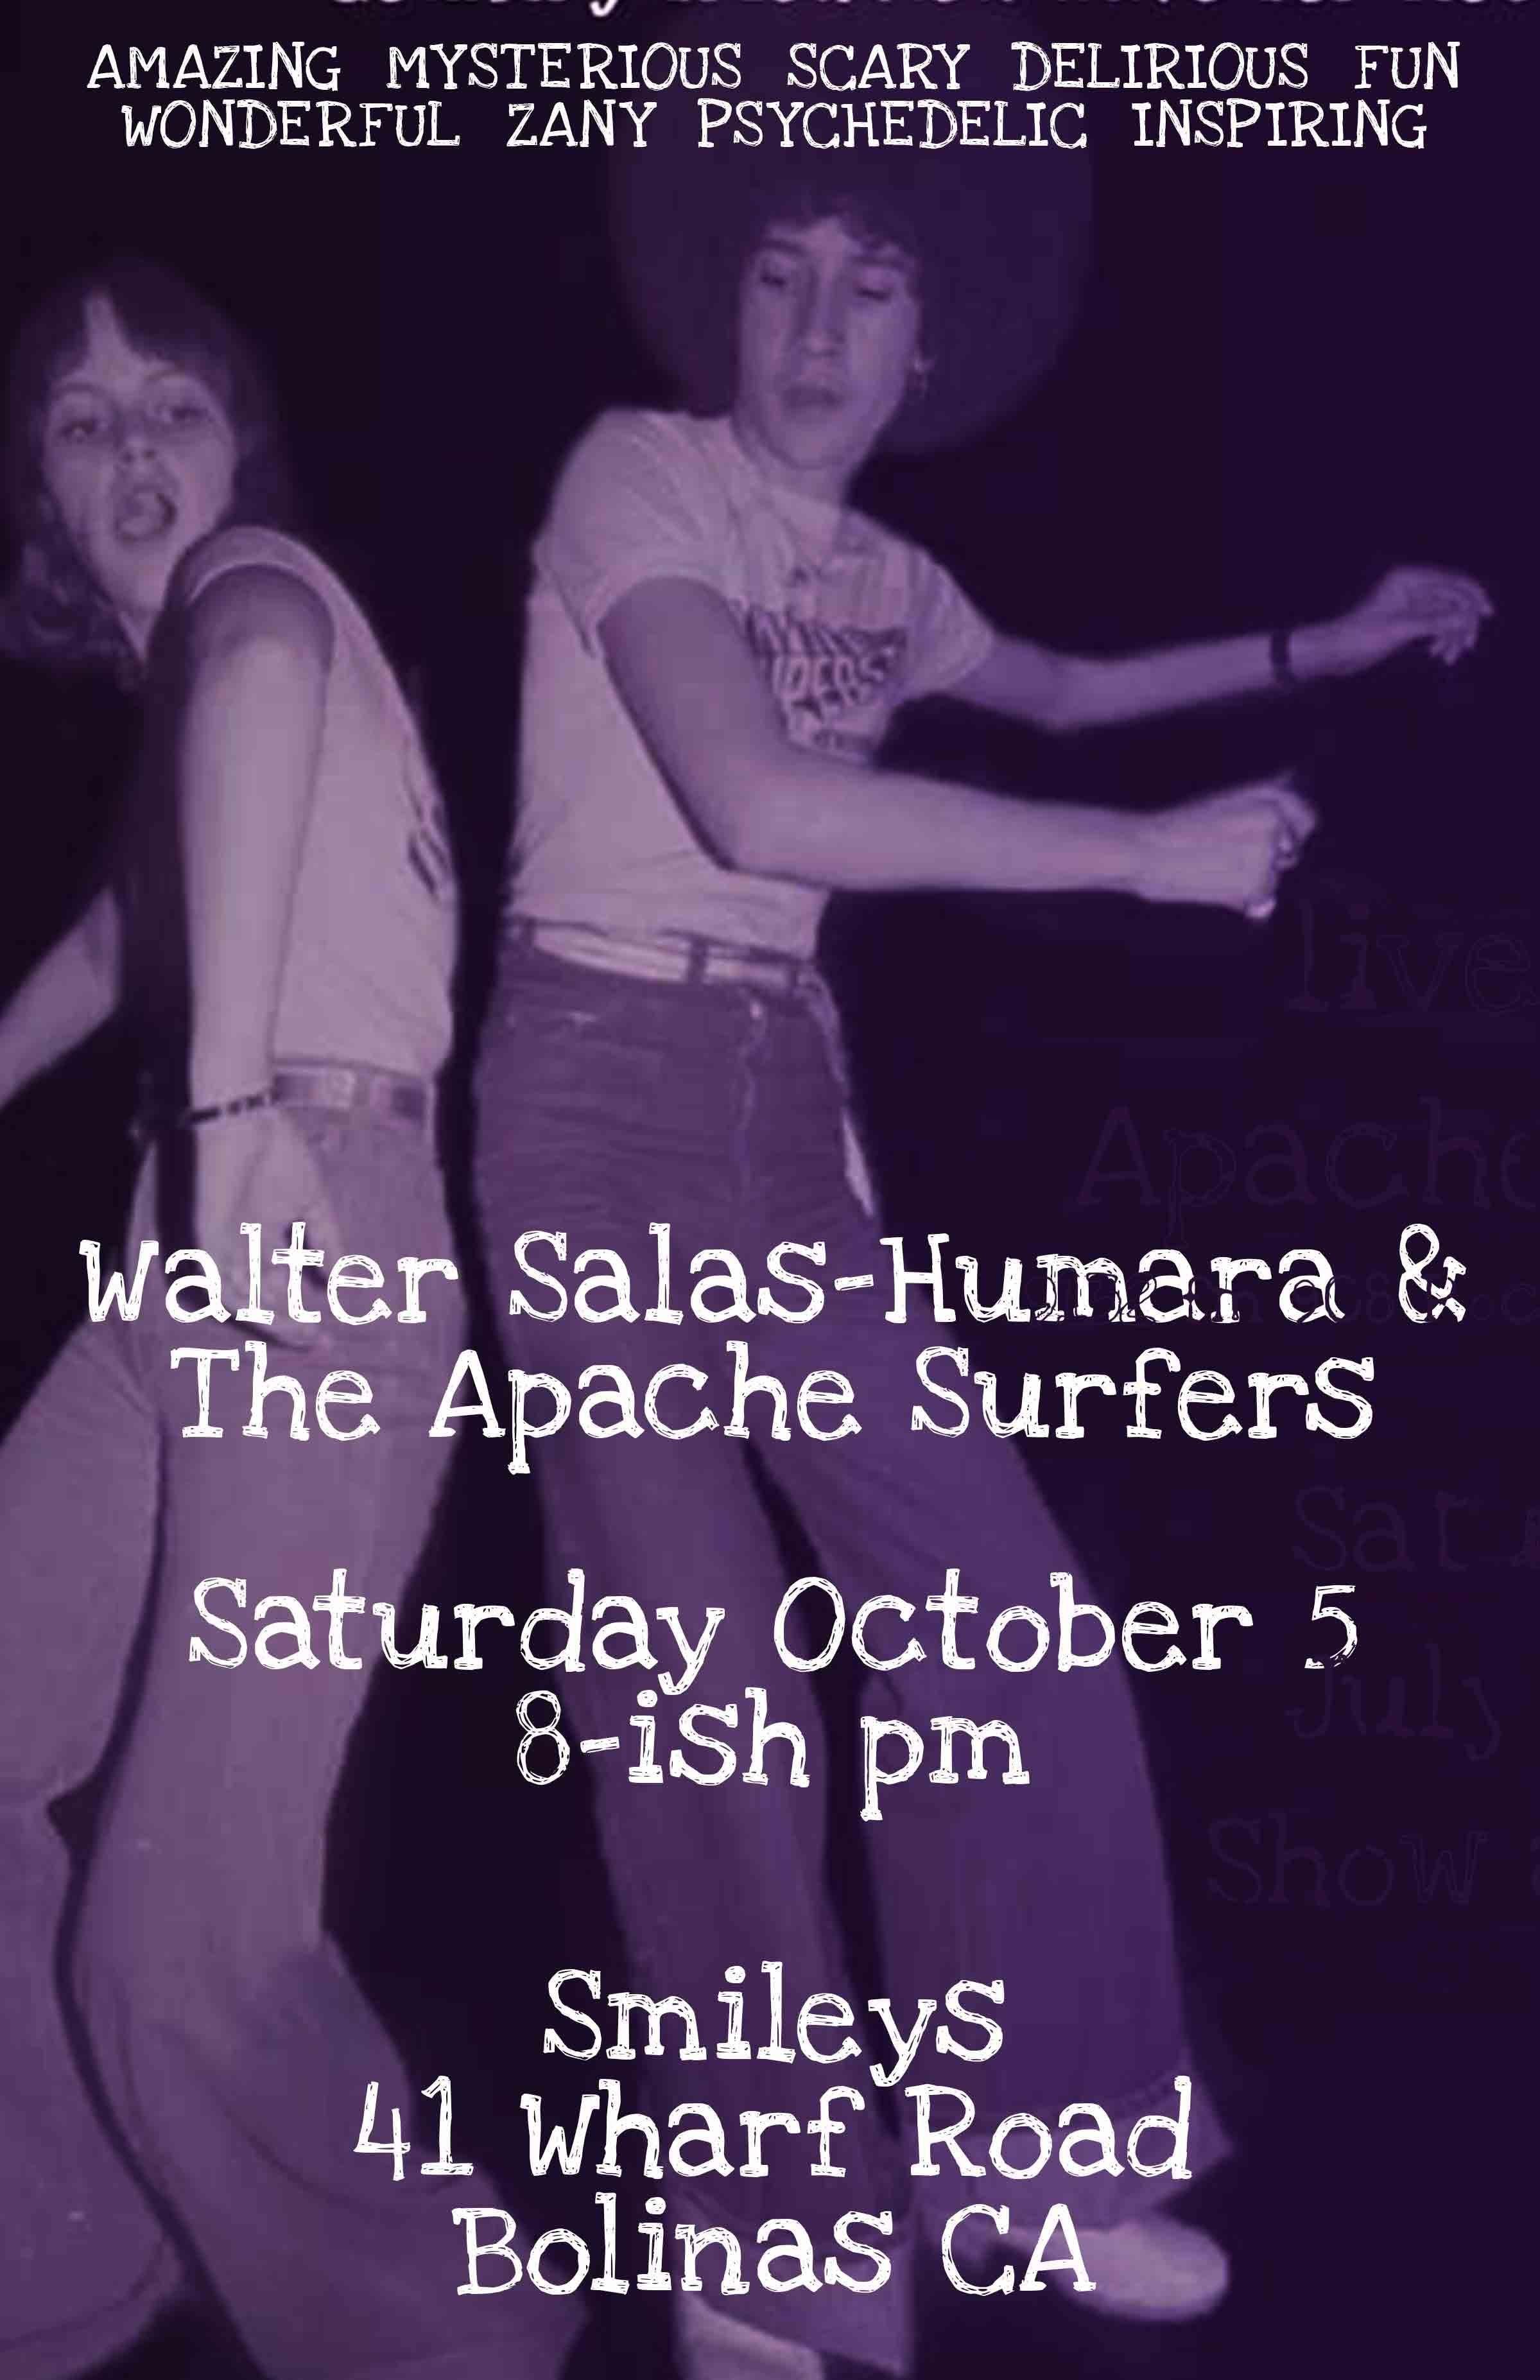 Walter Salas-Humara  and the Apache Surfers